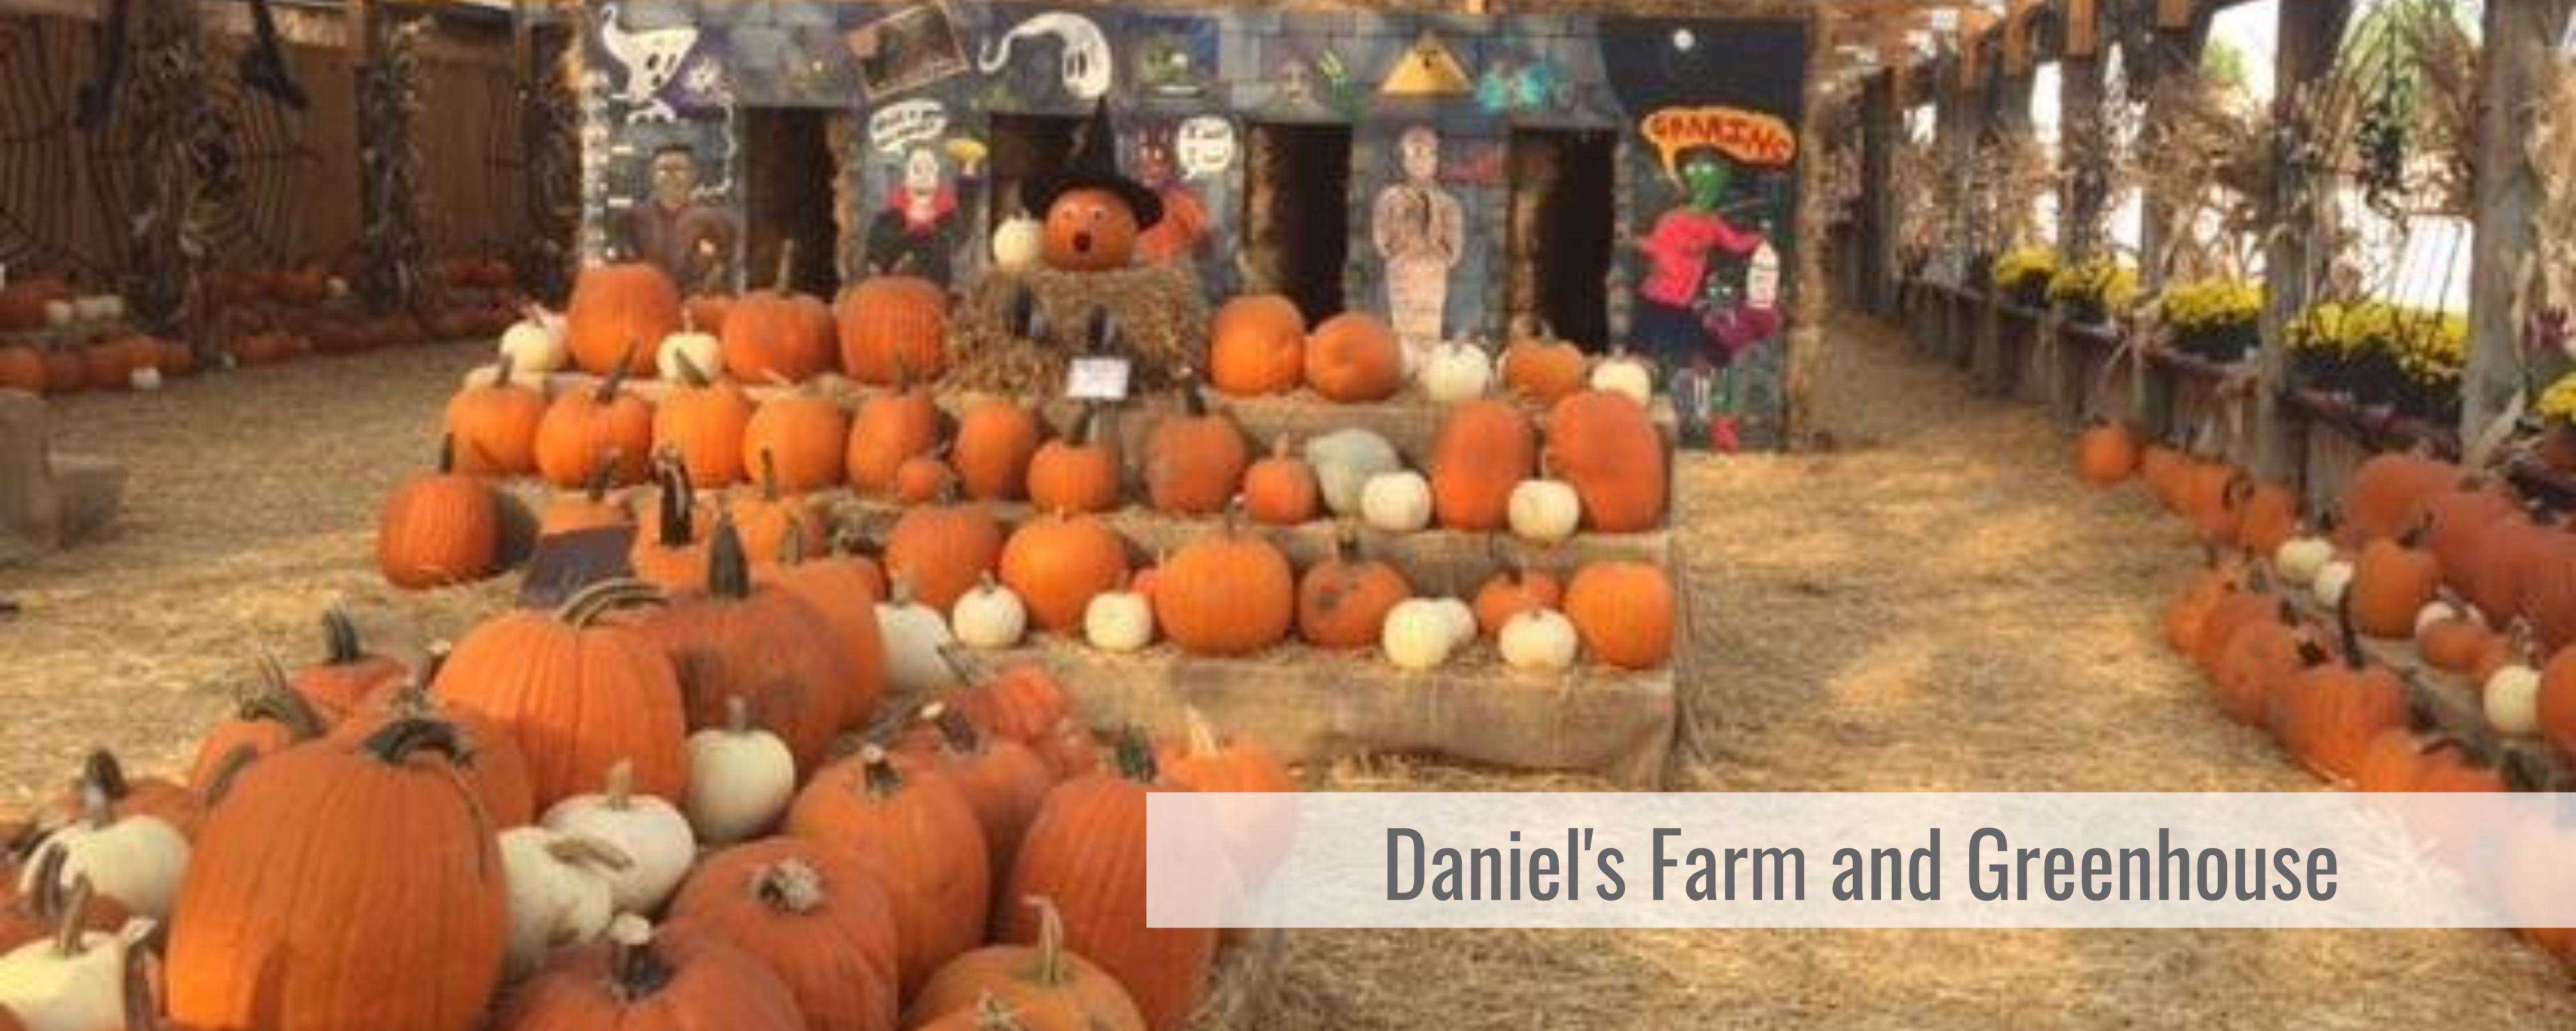 Daniels Farm and Greenhouse